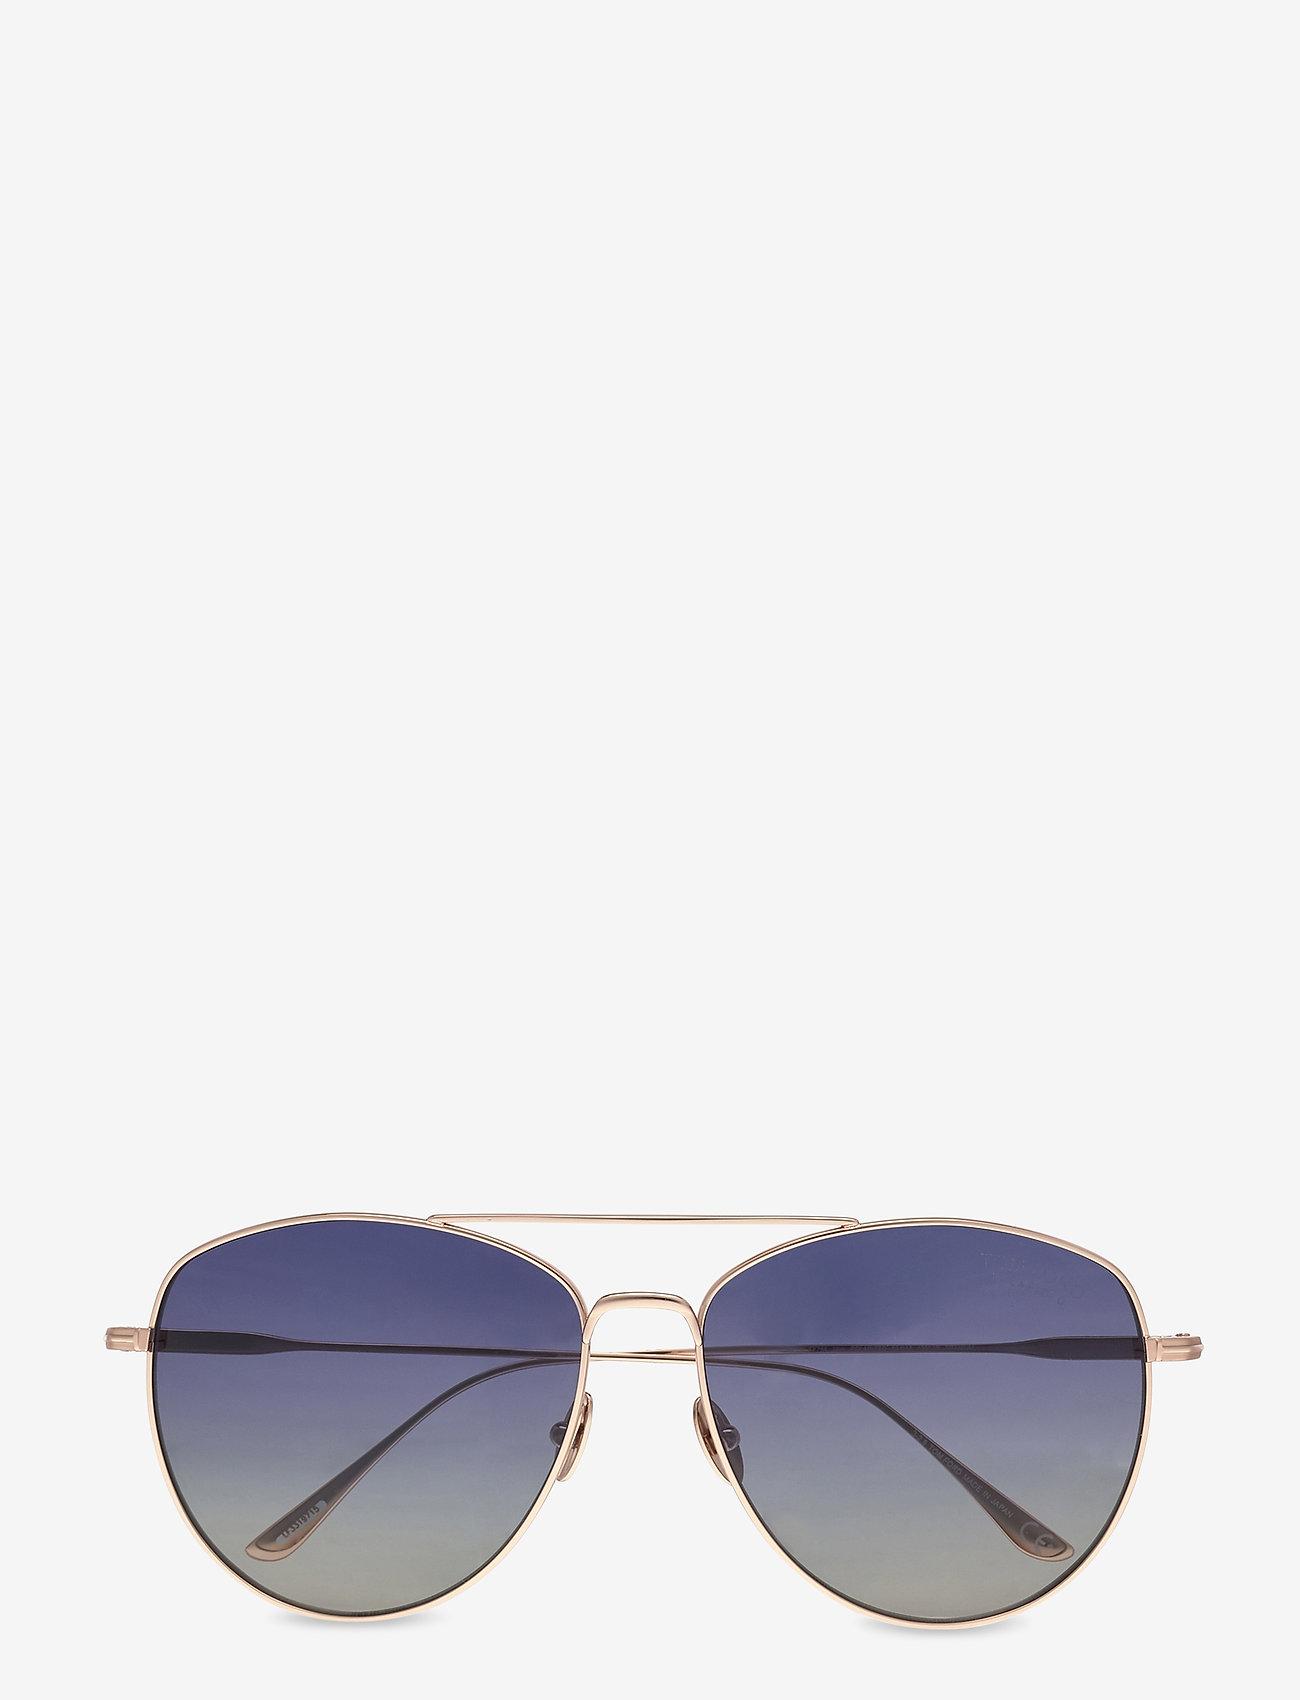 Tom Ford Sunglasses - Tom Ford MILLA - rond model - shiny rose gold - 0